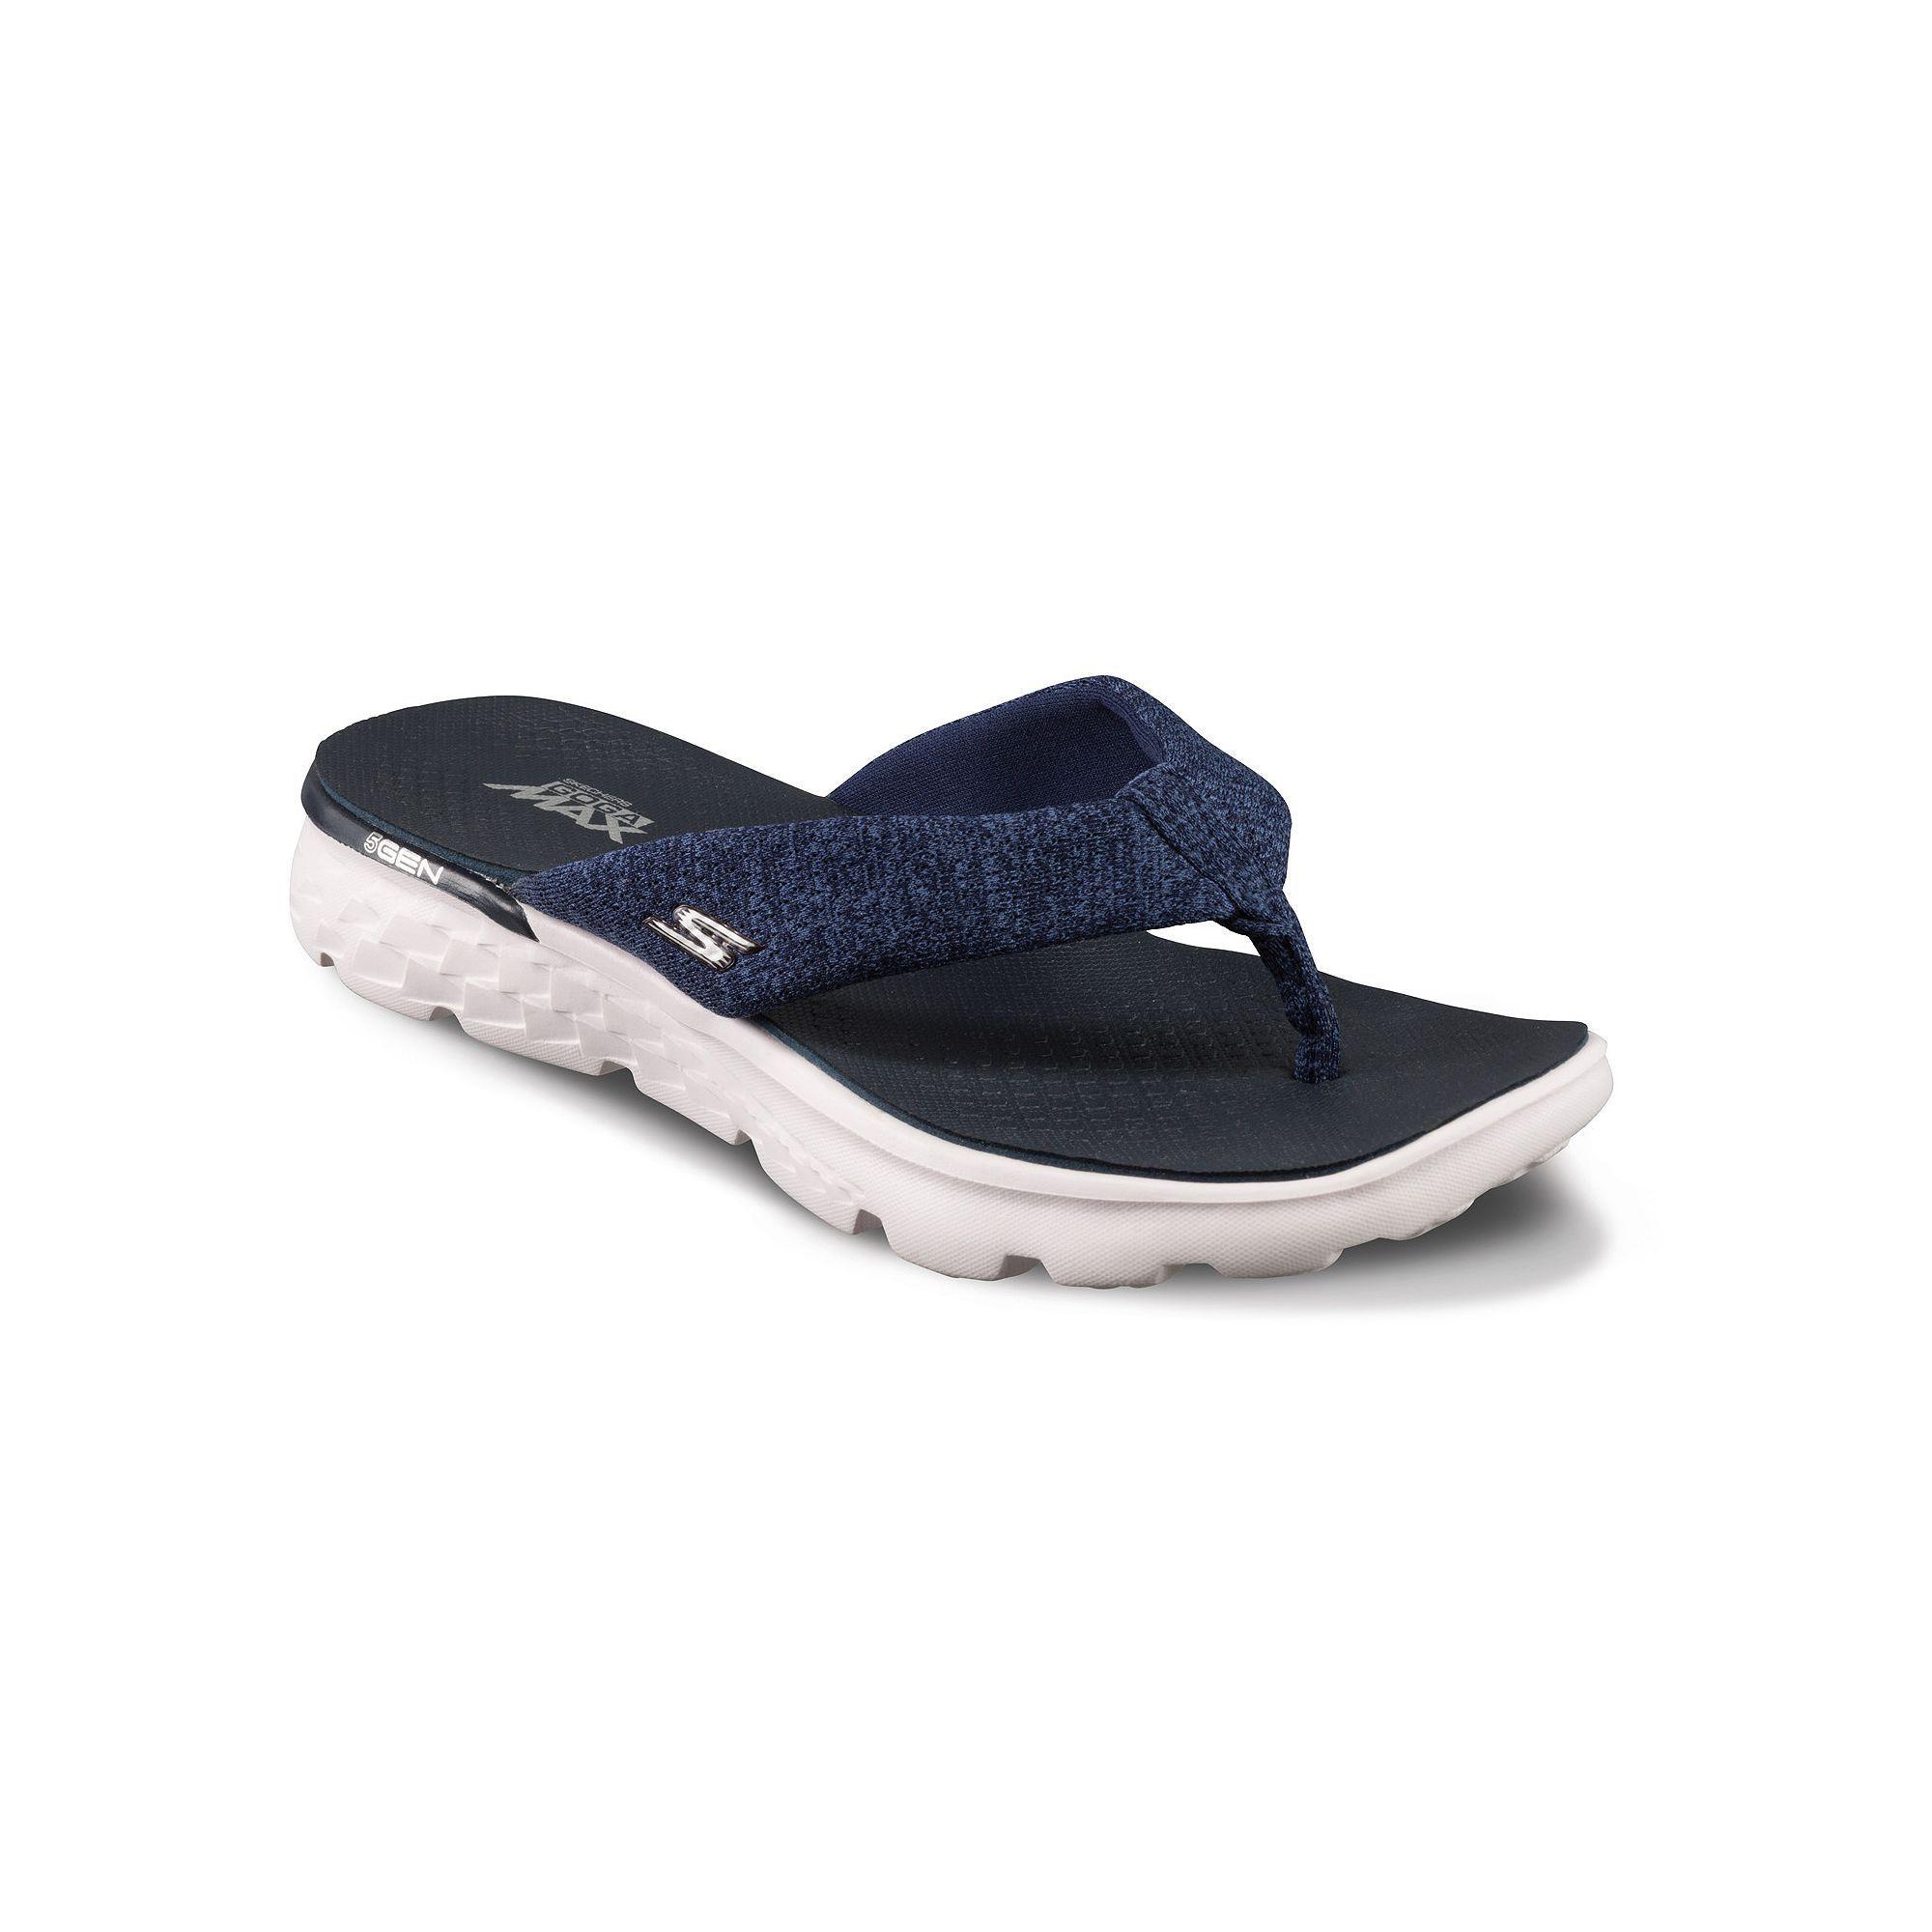 28a6a79438b Skechers On the GO 400 Vivacity Women s Sandals